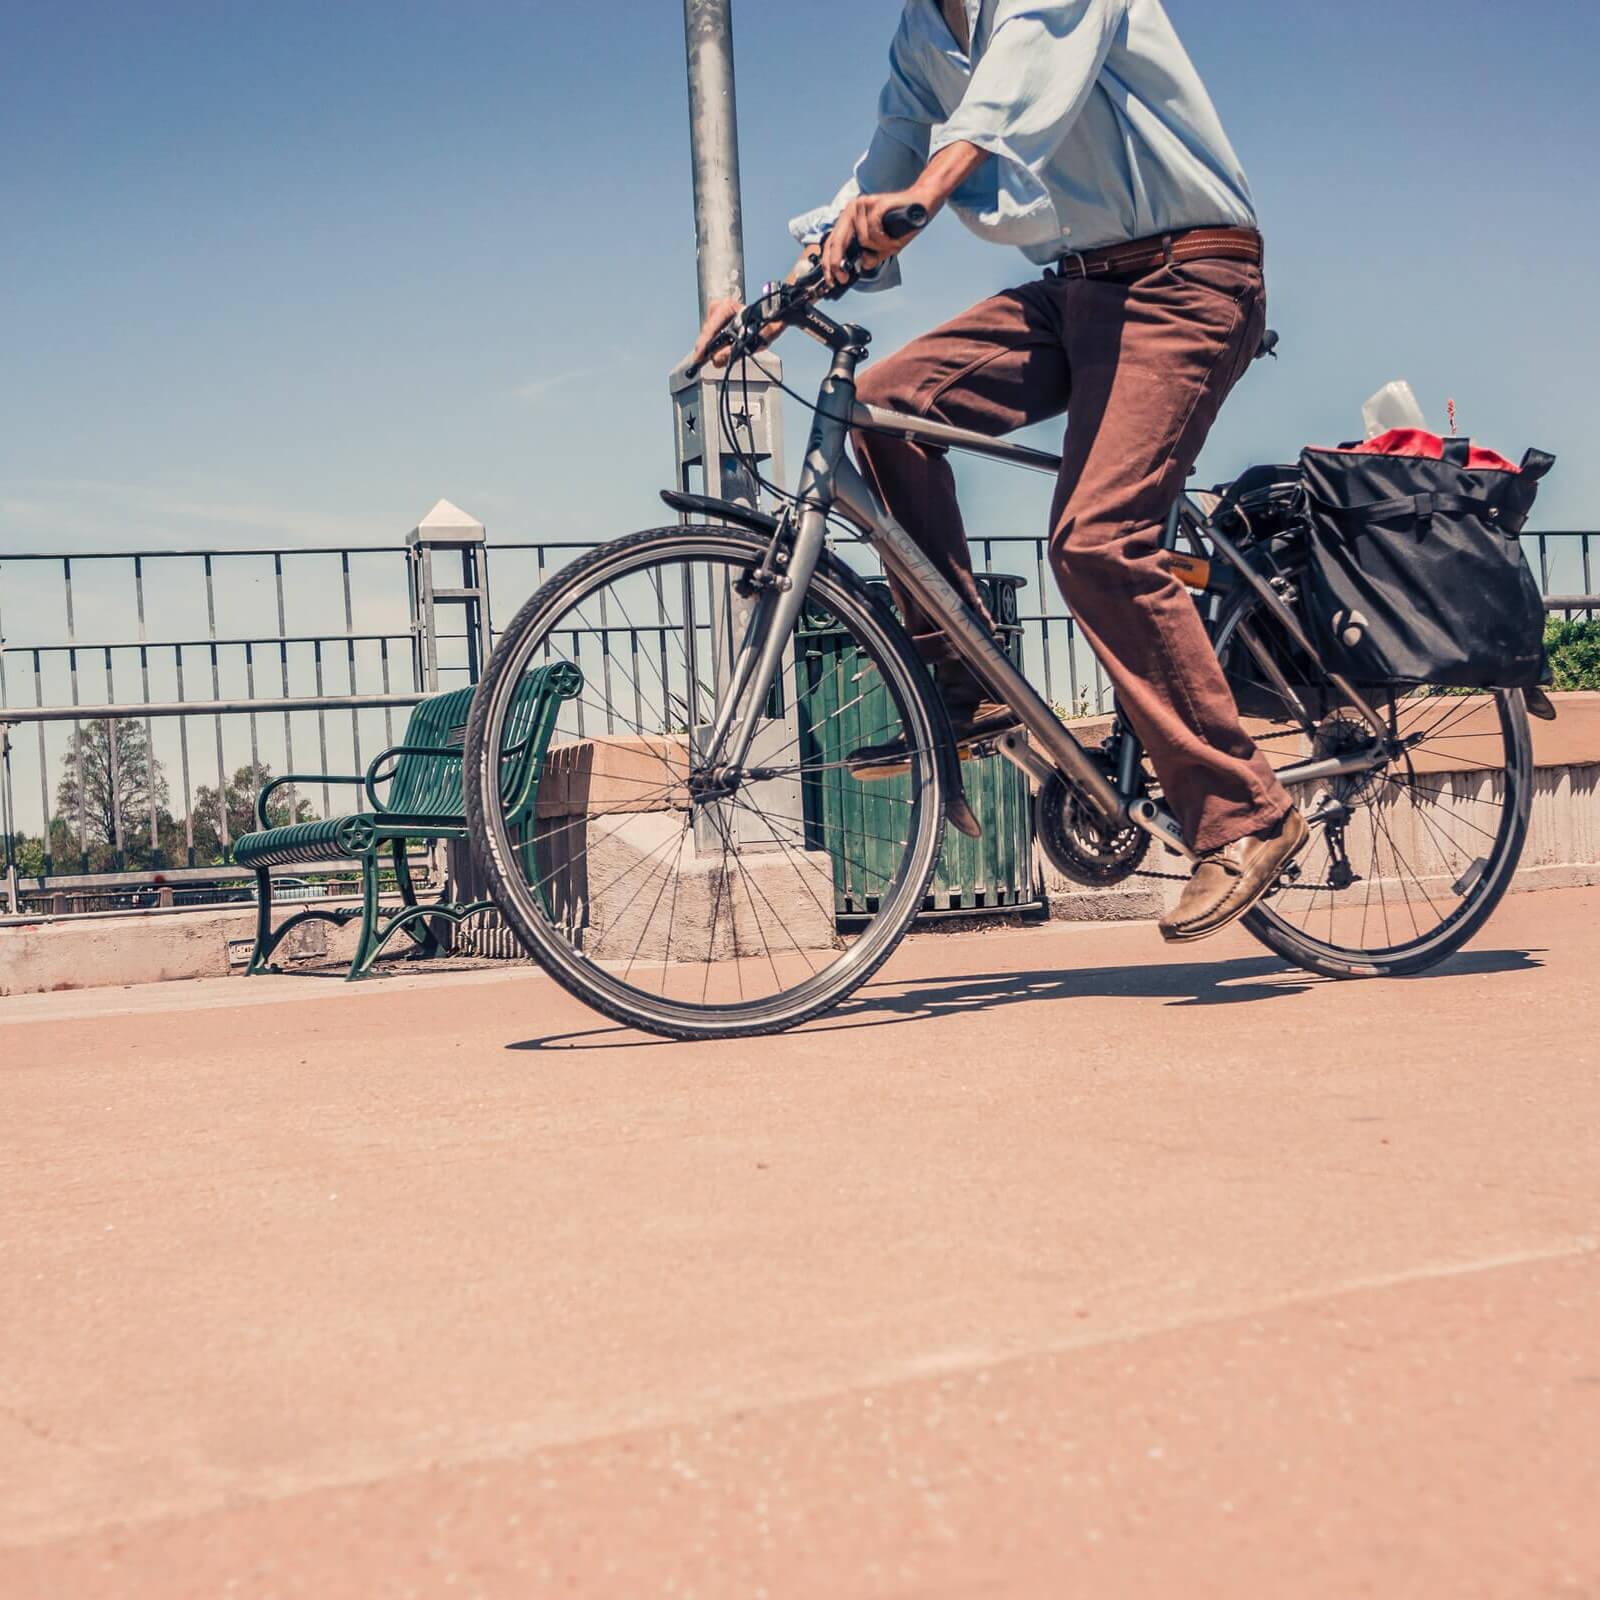 A man riding a bicycle